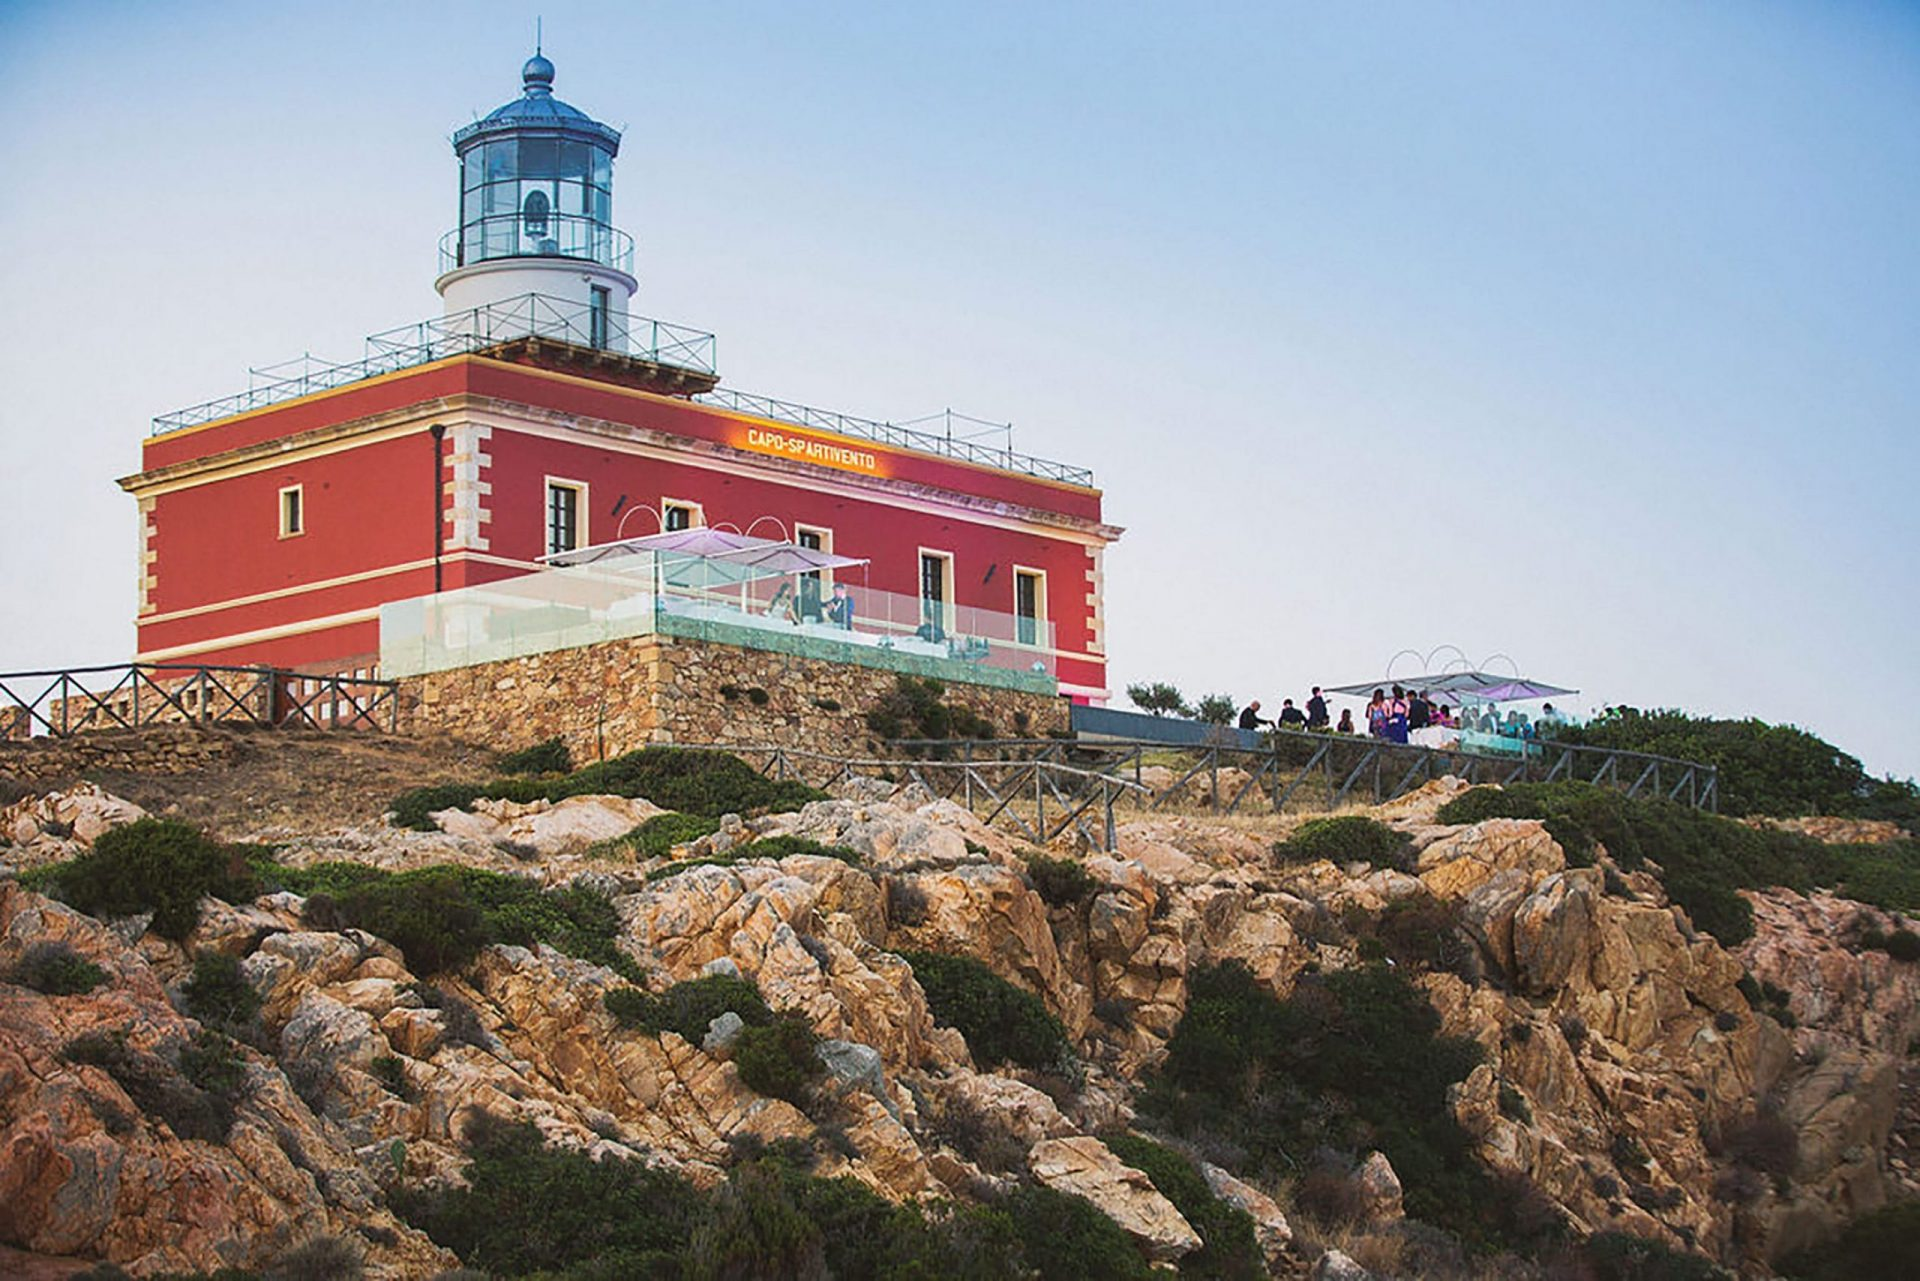 Faro di Capo Spartivento, Sardinia lighthouse